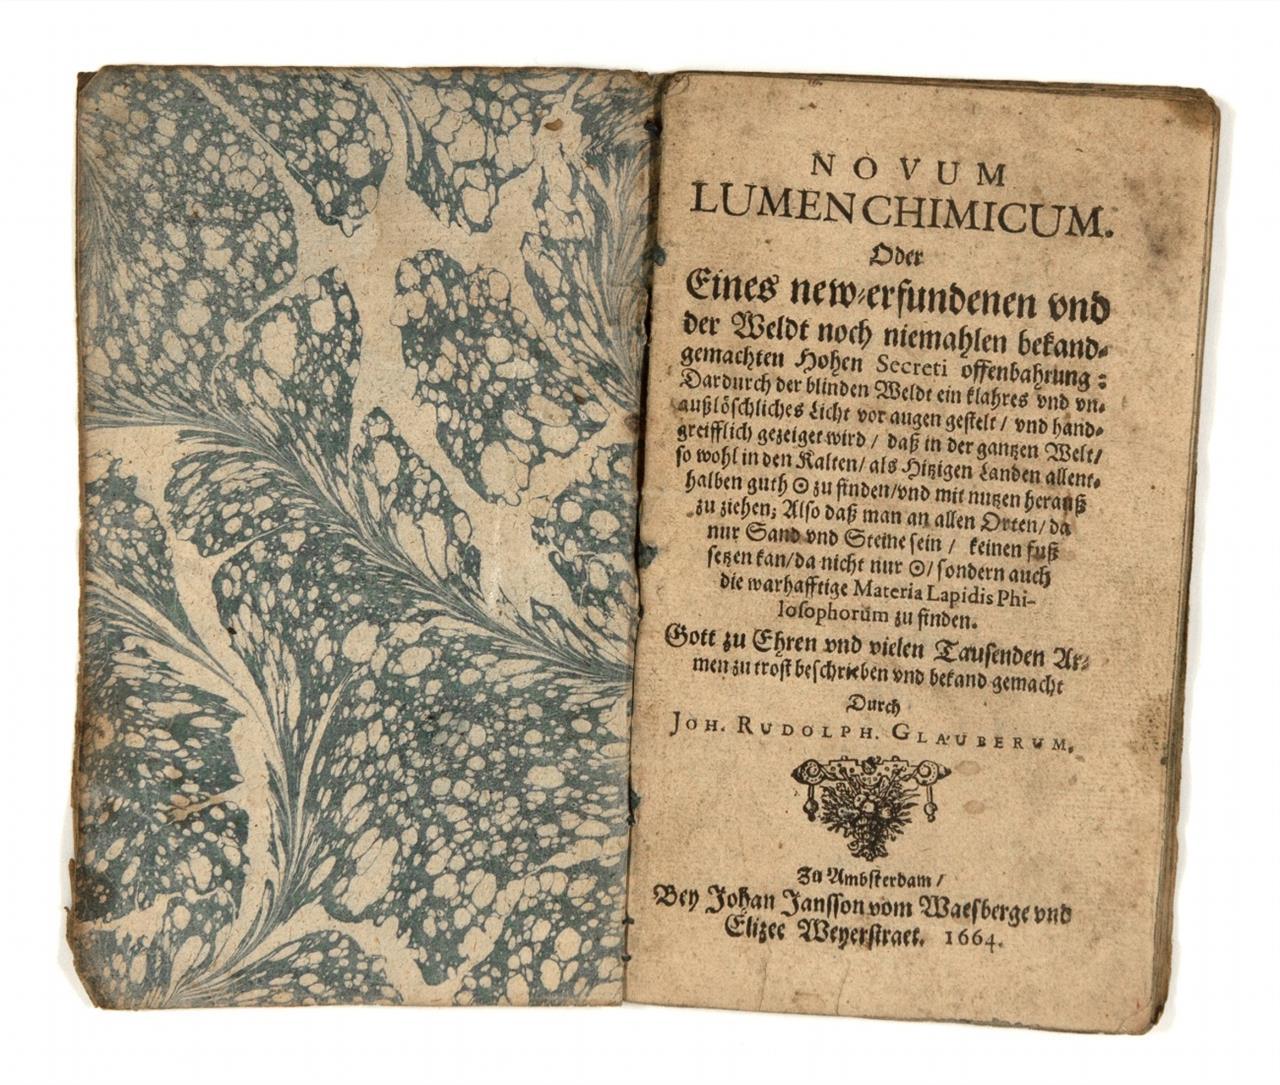 J. R. Glauber, Novum lumen chimicum. Amsterdam 1664.